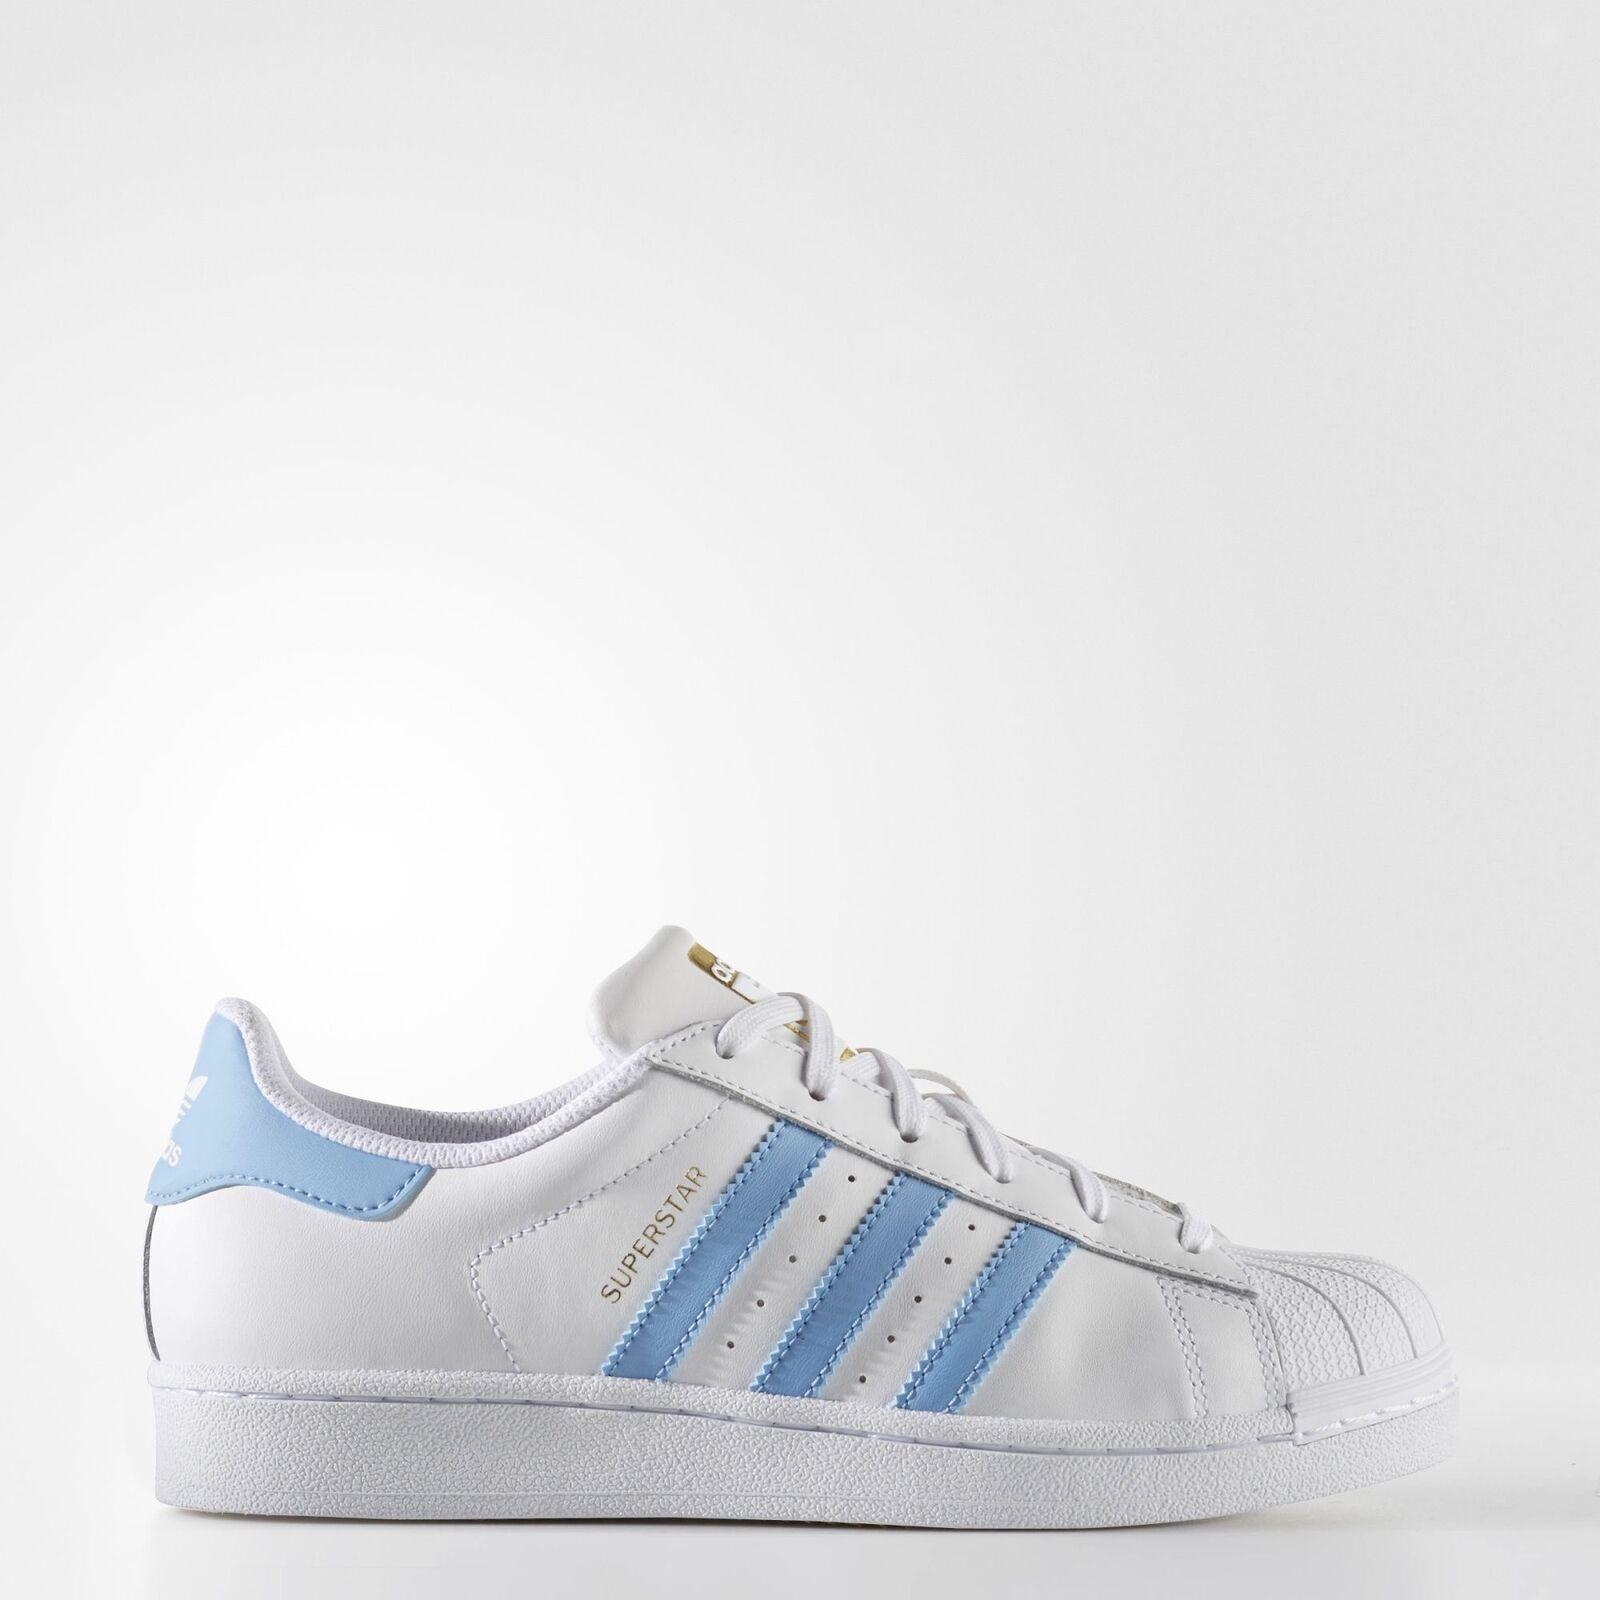 Adidas Mujer Superestrella Zapatos Ebay hKTzR7